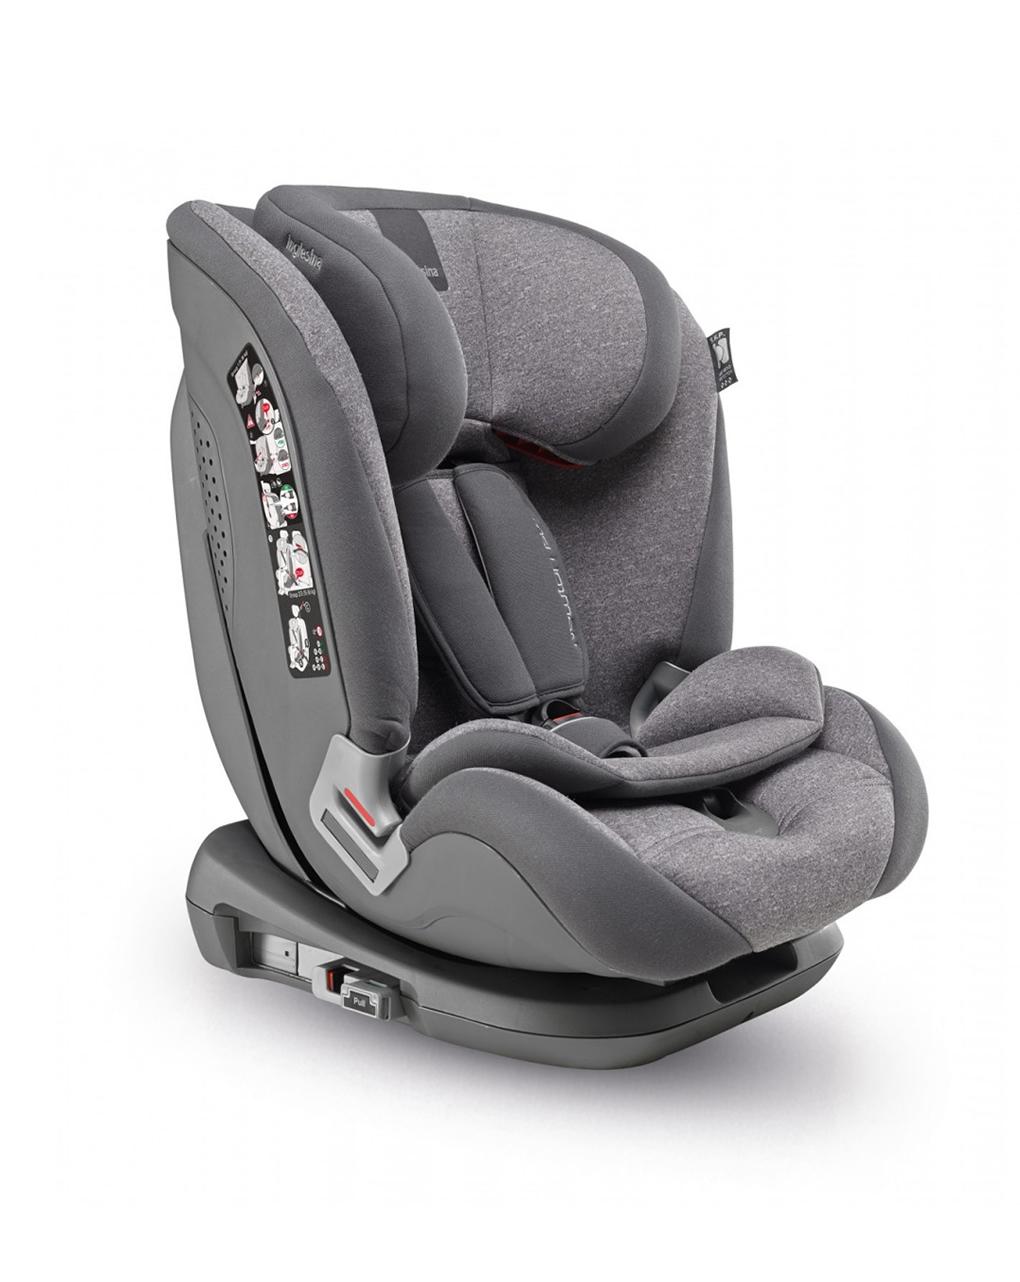 Cadeira auto inglesina newton 1.2.3 ifix, cinza - Inglesina